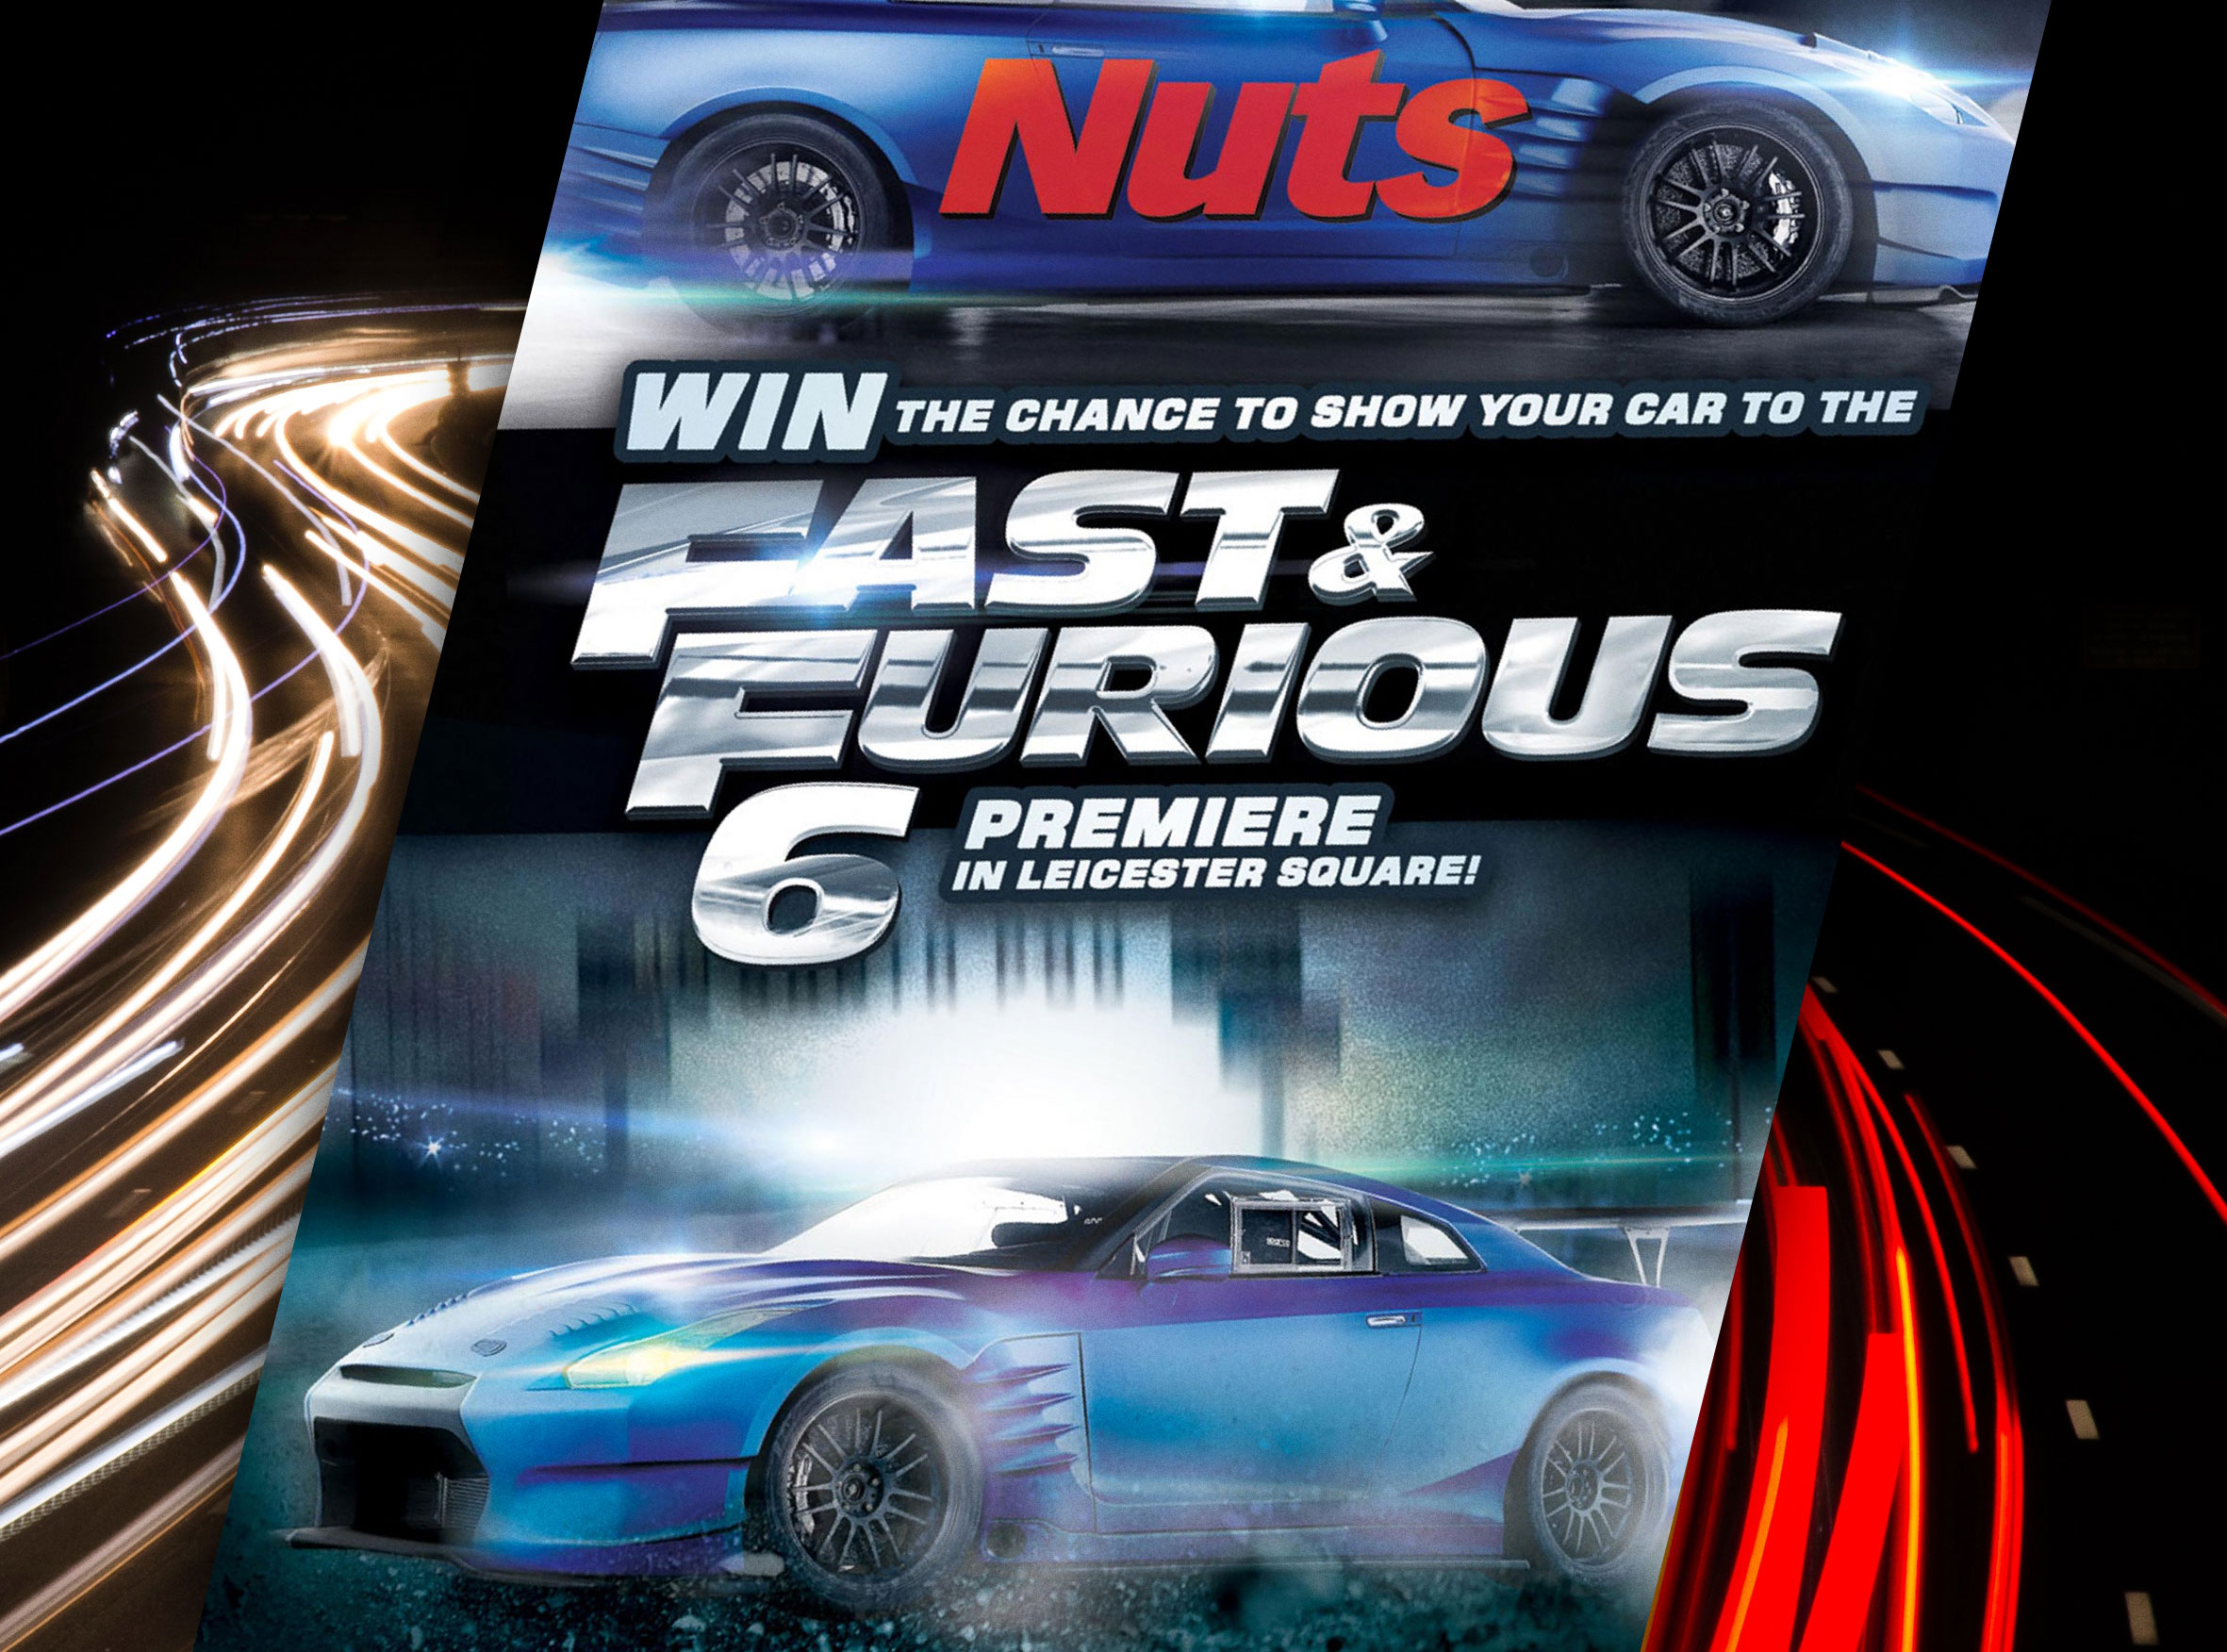 Fast & Furious 6 – Santa Pod Raceway